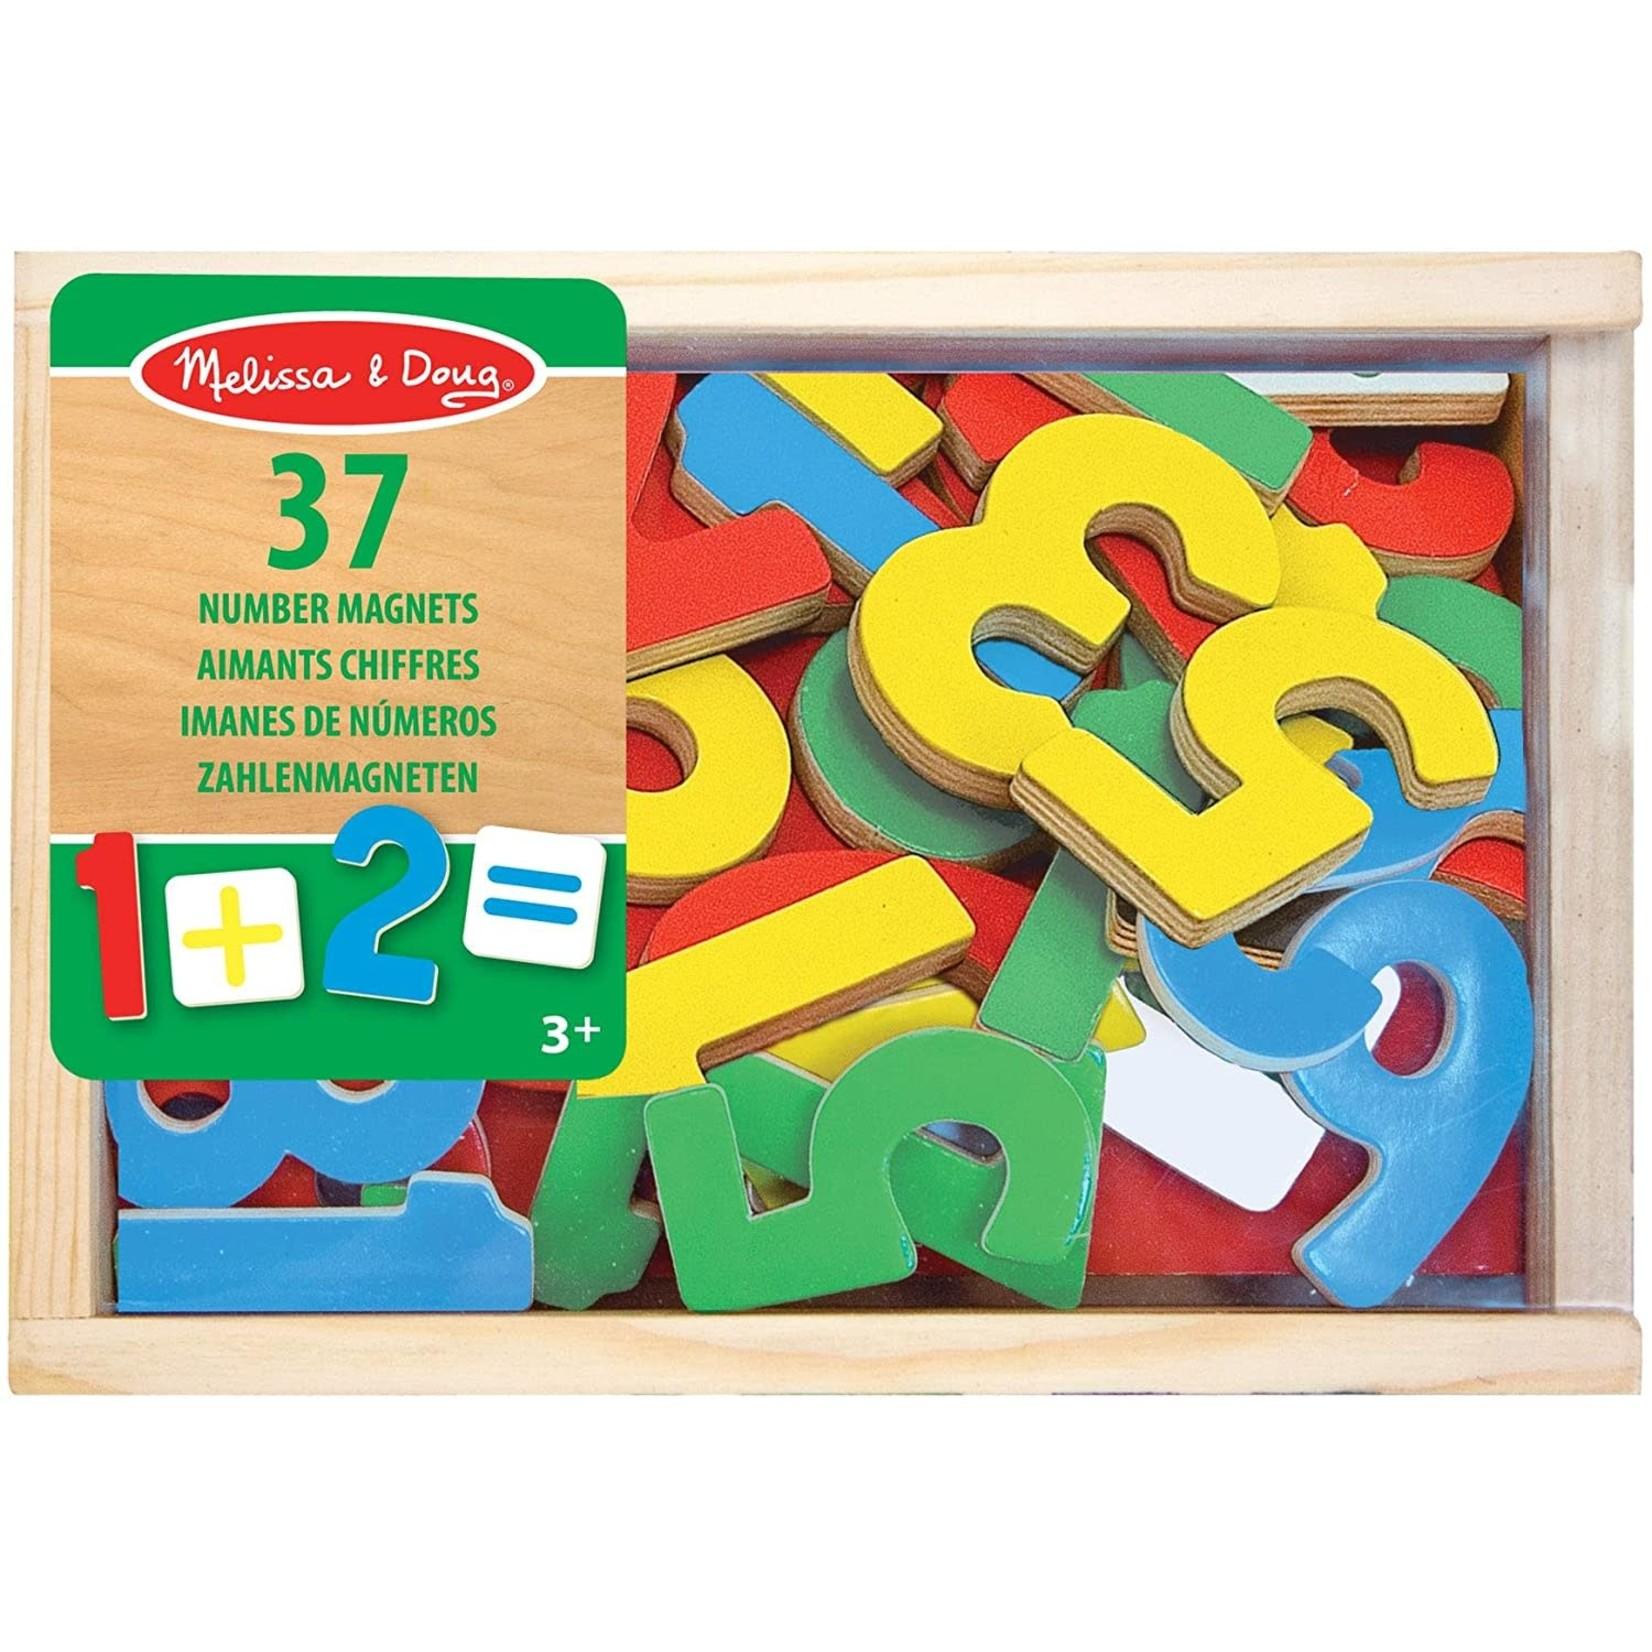 Melissa & Doug Wooden Number Magnets